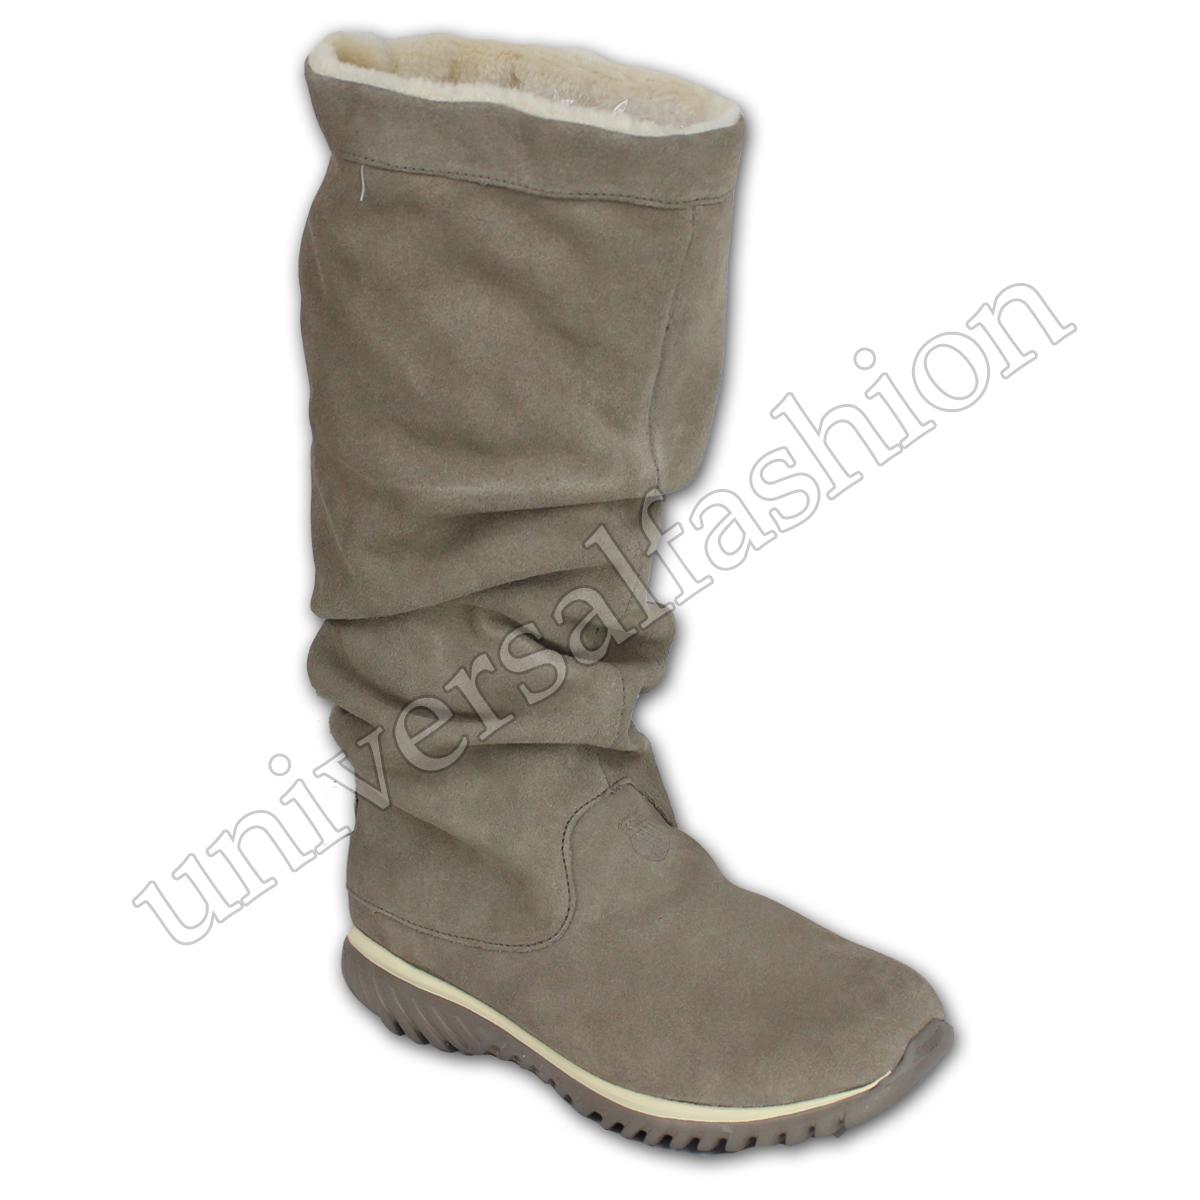 Hoja Claro Zapatos Caña K Mujer Botas Media Forro Swiss Recuperación aITAqXnFwx